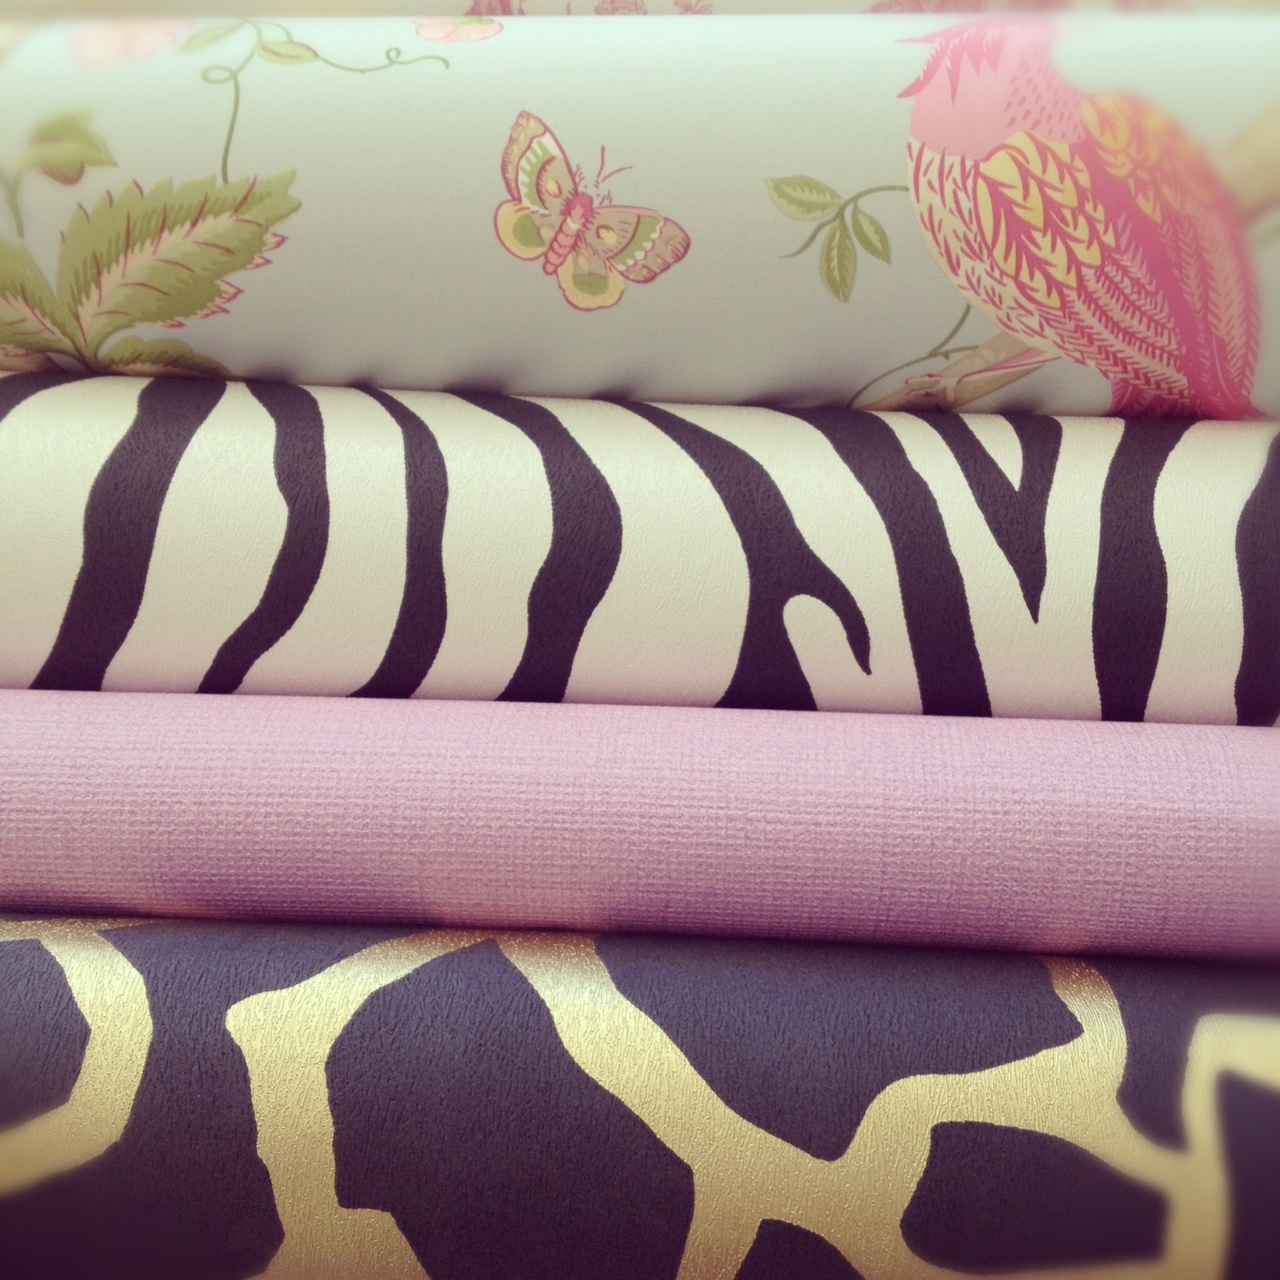 http://1.bp.blogspot.com/-46FR8tk8E_s/UCSD3WVXUvI/AAAAAAAADEw/gzwoPhOlgGU/s1600/Wallpaper+Masters+lilacs+and+zebra.jpg